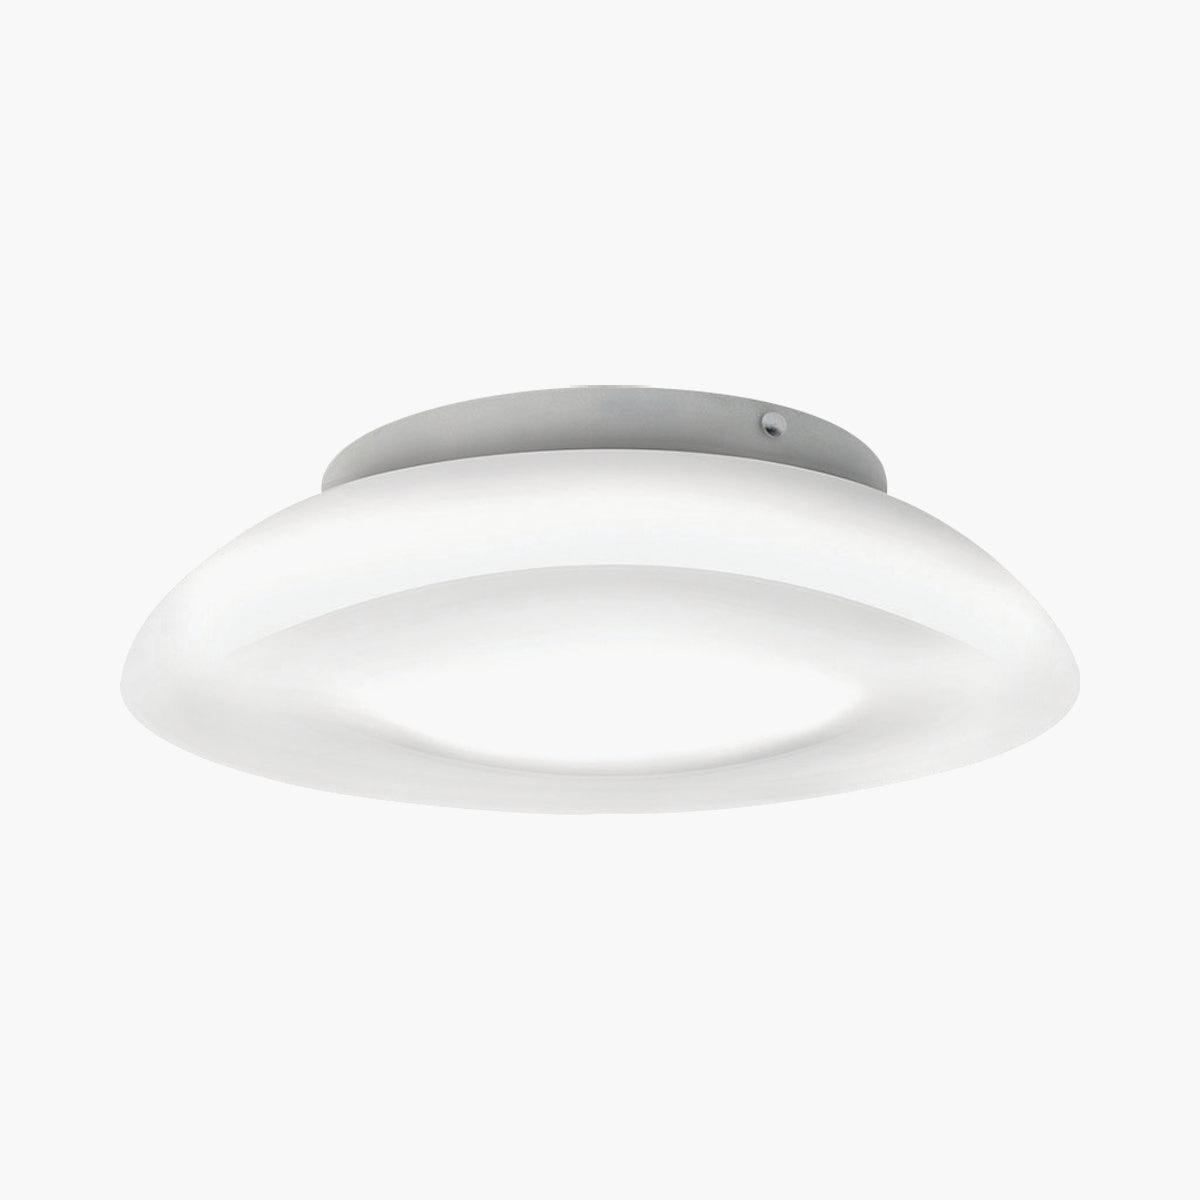 Lunex Ceiling/Wall Light